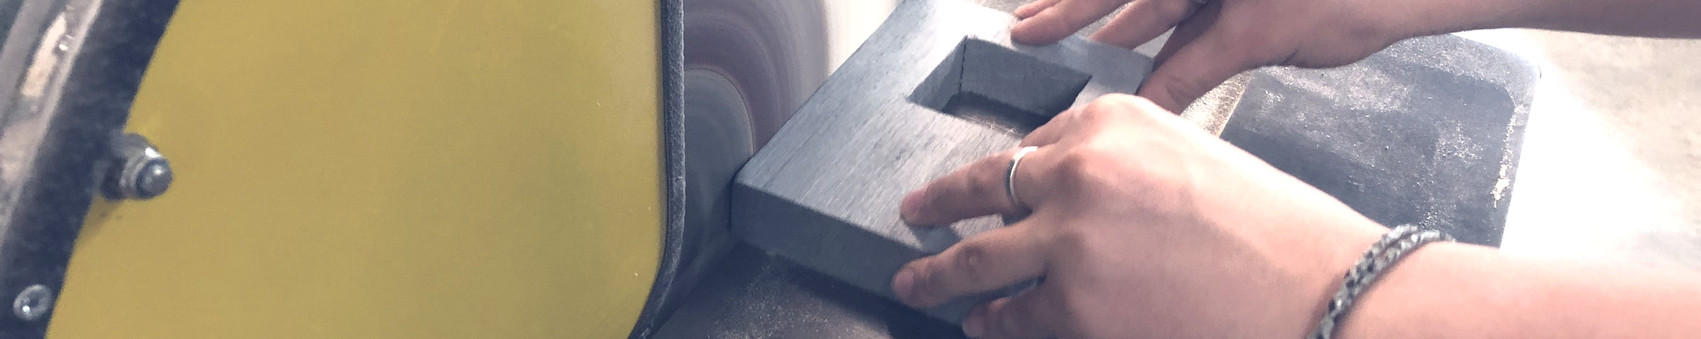 The Sand Paper Machine